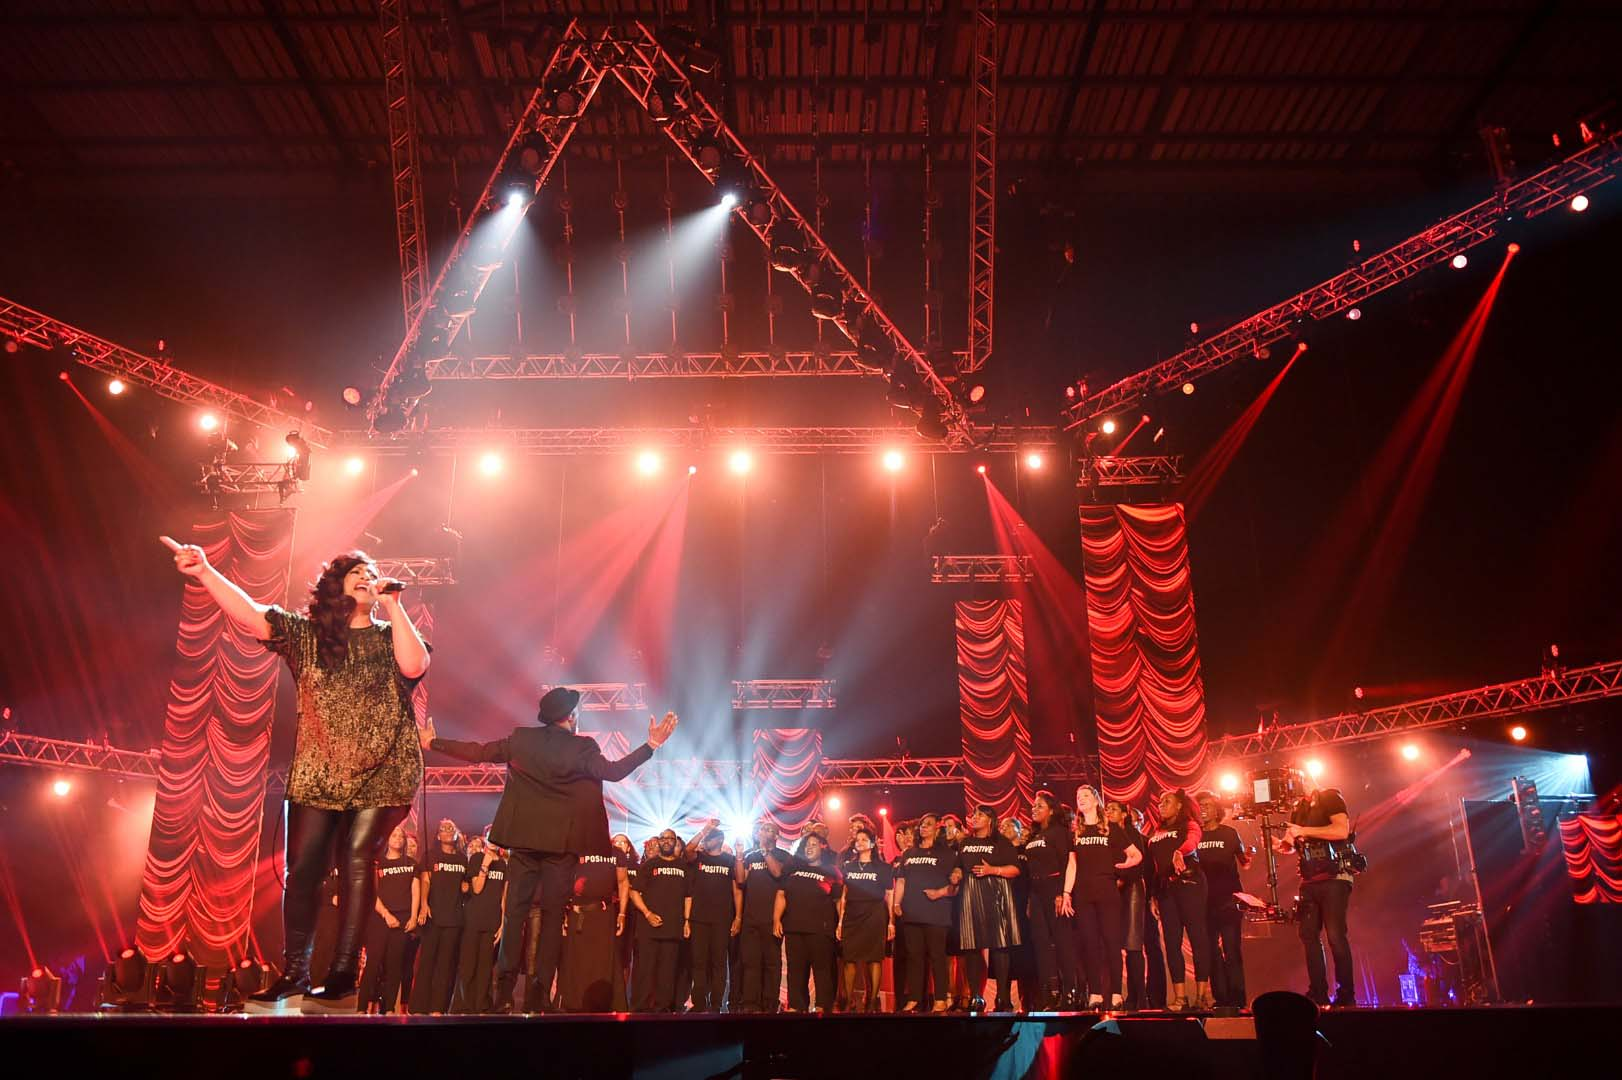 The B Positive choir at the 2017 MOBO Awards